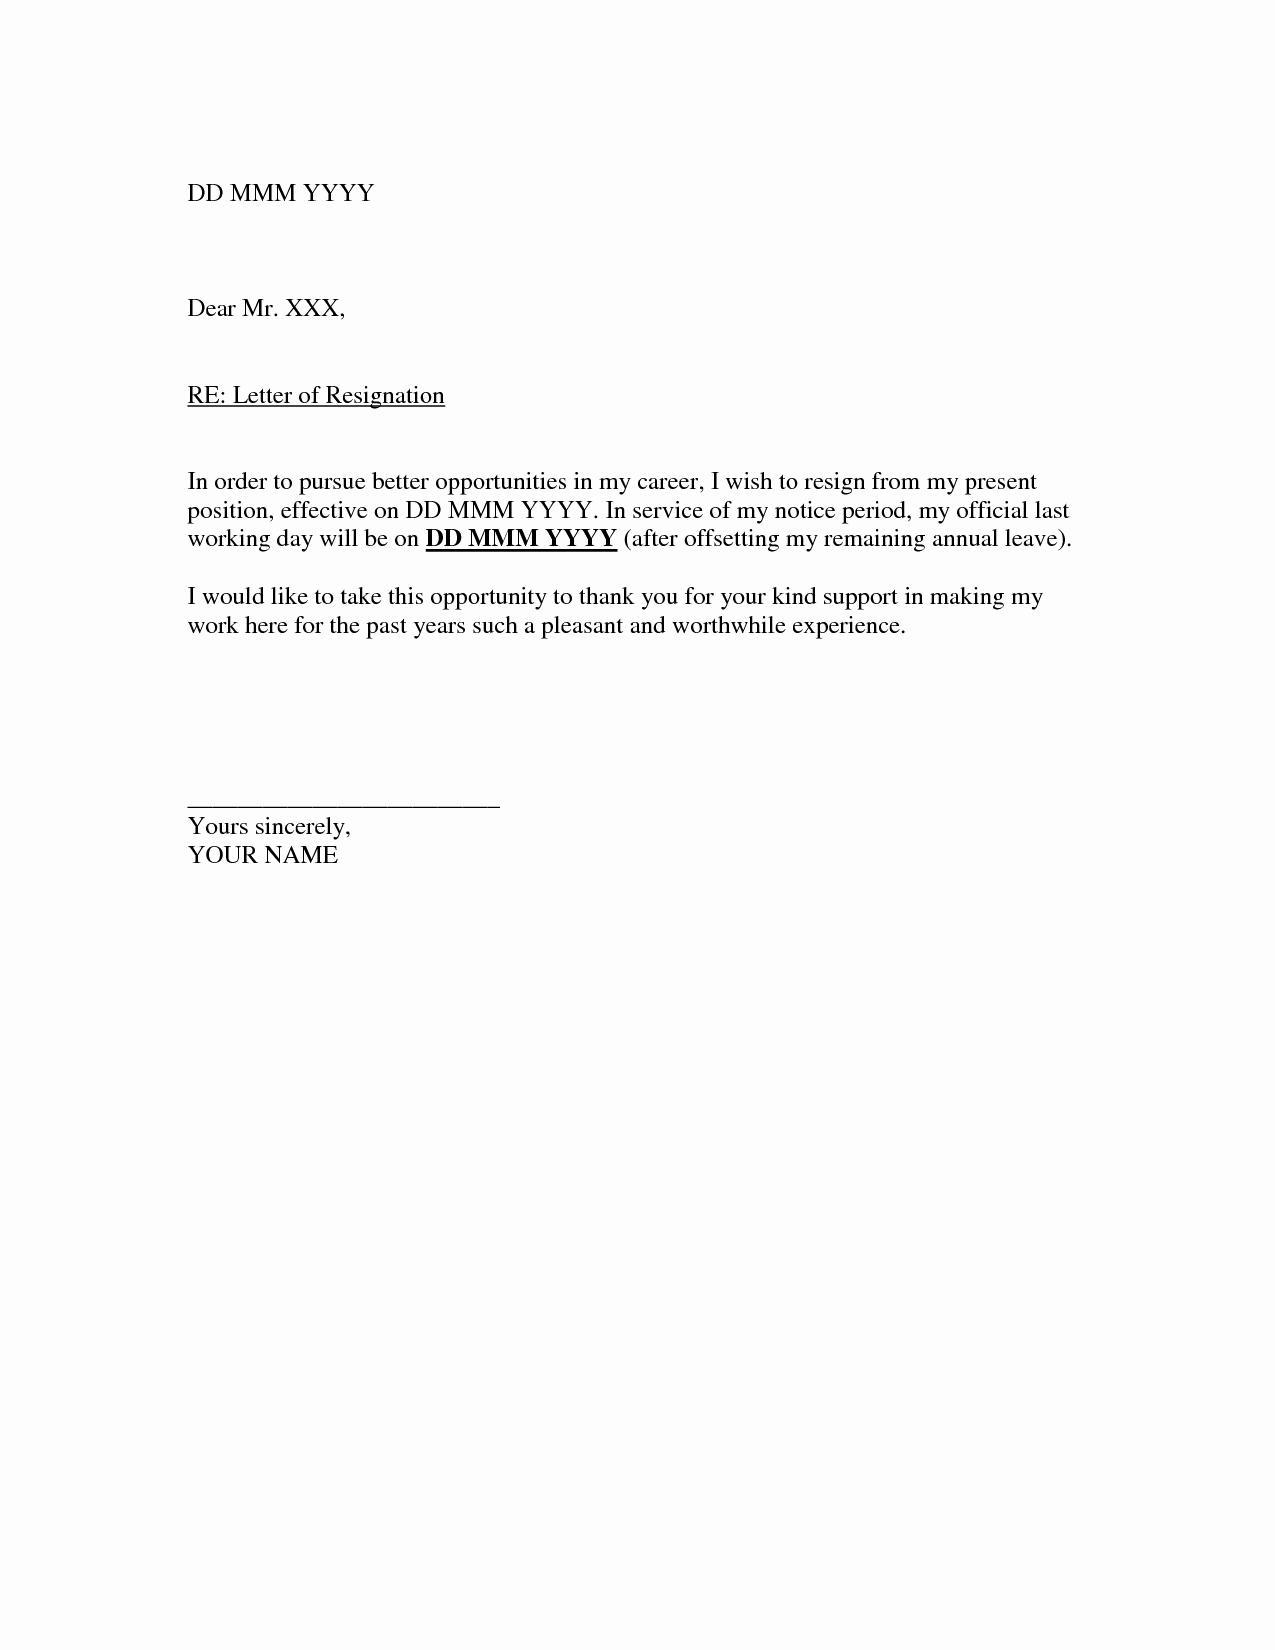 Resignation Letter Template Free Beautiful Resignation Letter Template